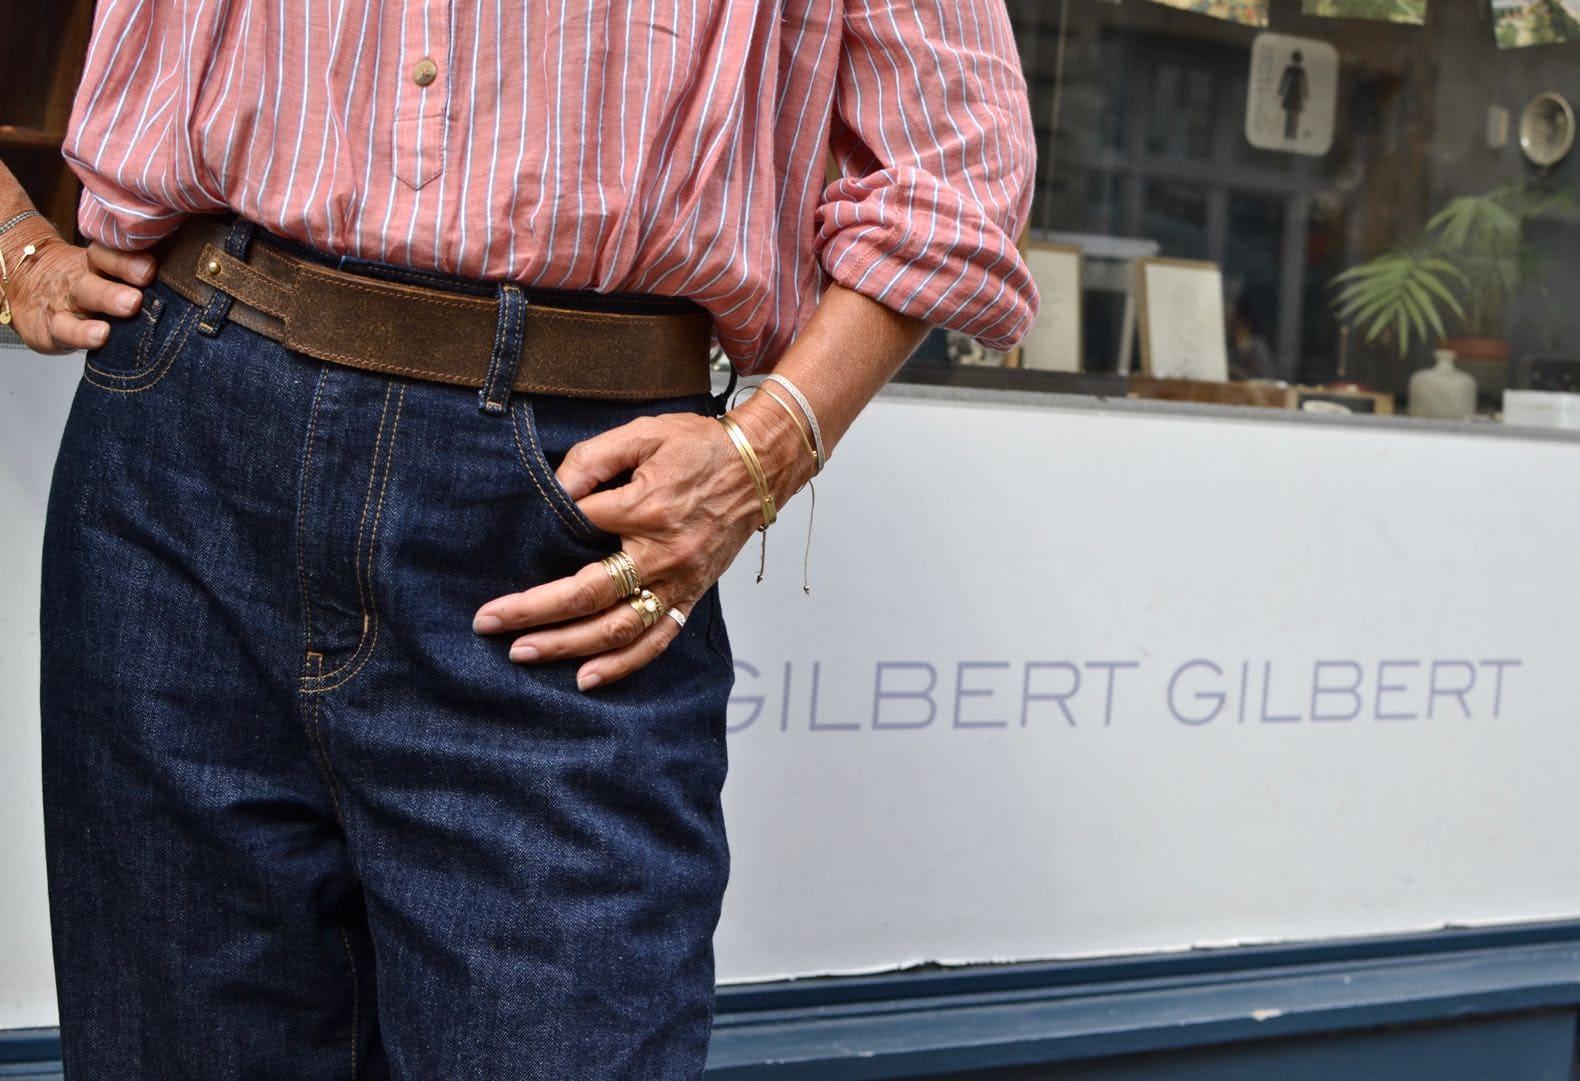 sylvie fondatrice de la marque gilbert gilbert